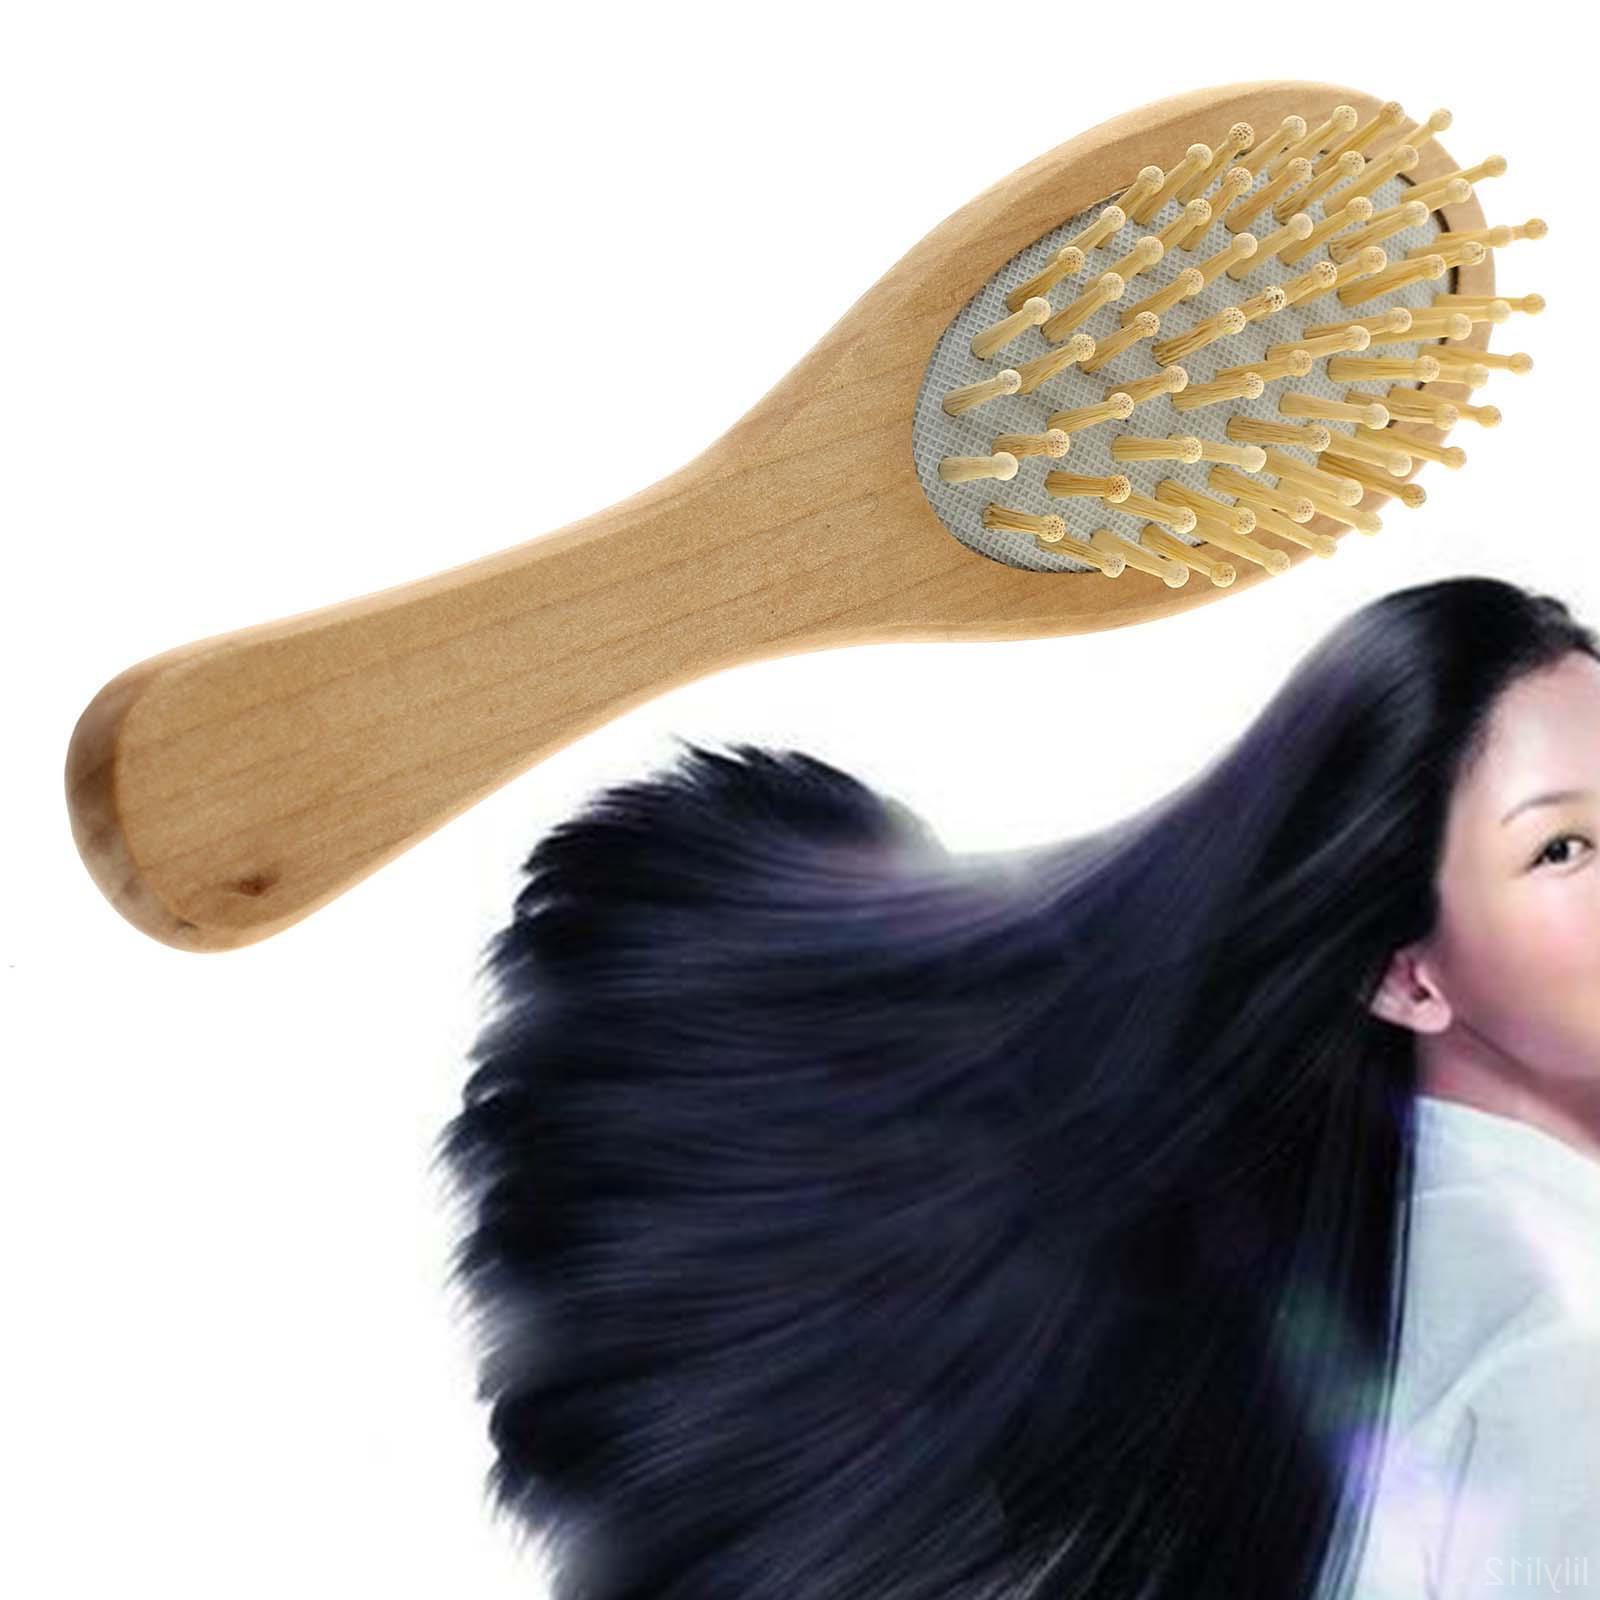 1* Natural Hair Care Massager Wood Massage RS